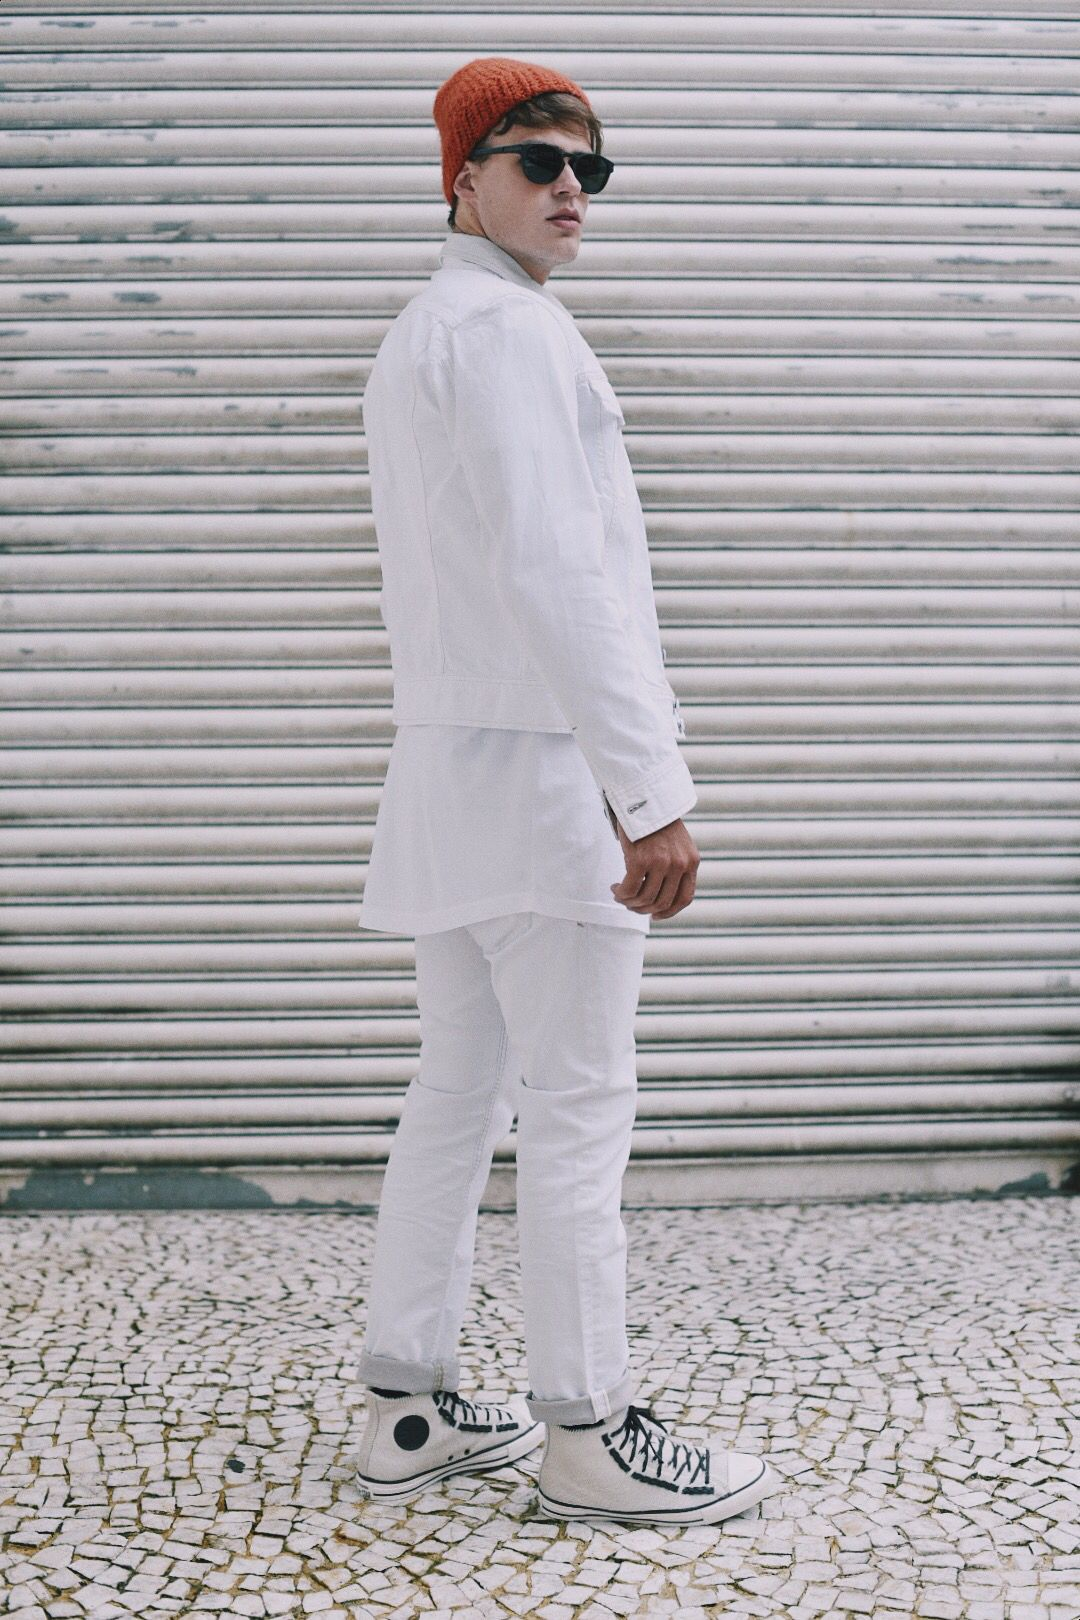 Editorial @piratastyle Modelo @marcelotaporosky @elomanegement Fotos @masaliby Direção/styling @tongomes Camiseta/ Calça/ jaqueta @diesel Tênis @converse Touca @cottonproject Oculos @oakley www.piratastyle.com